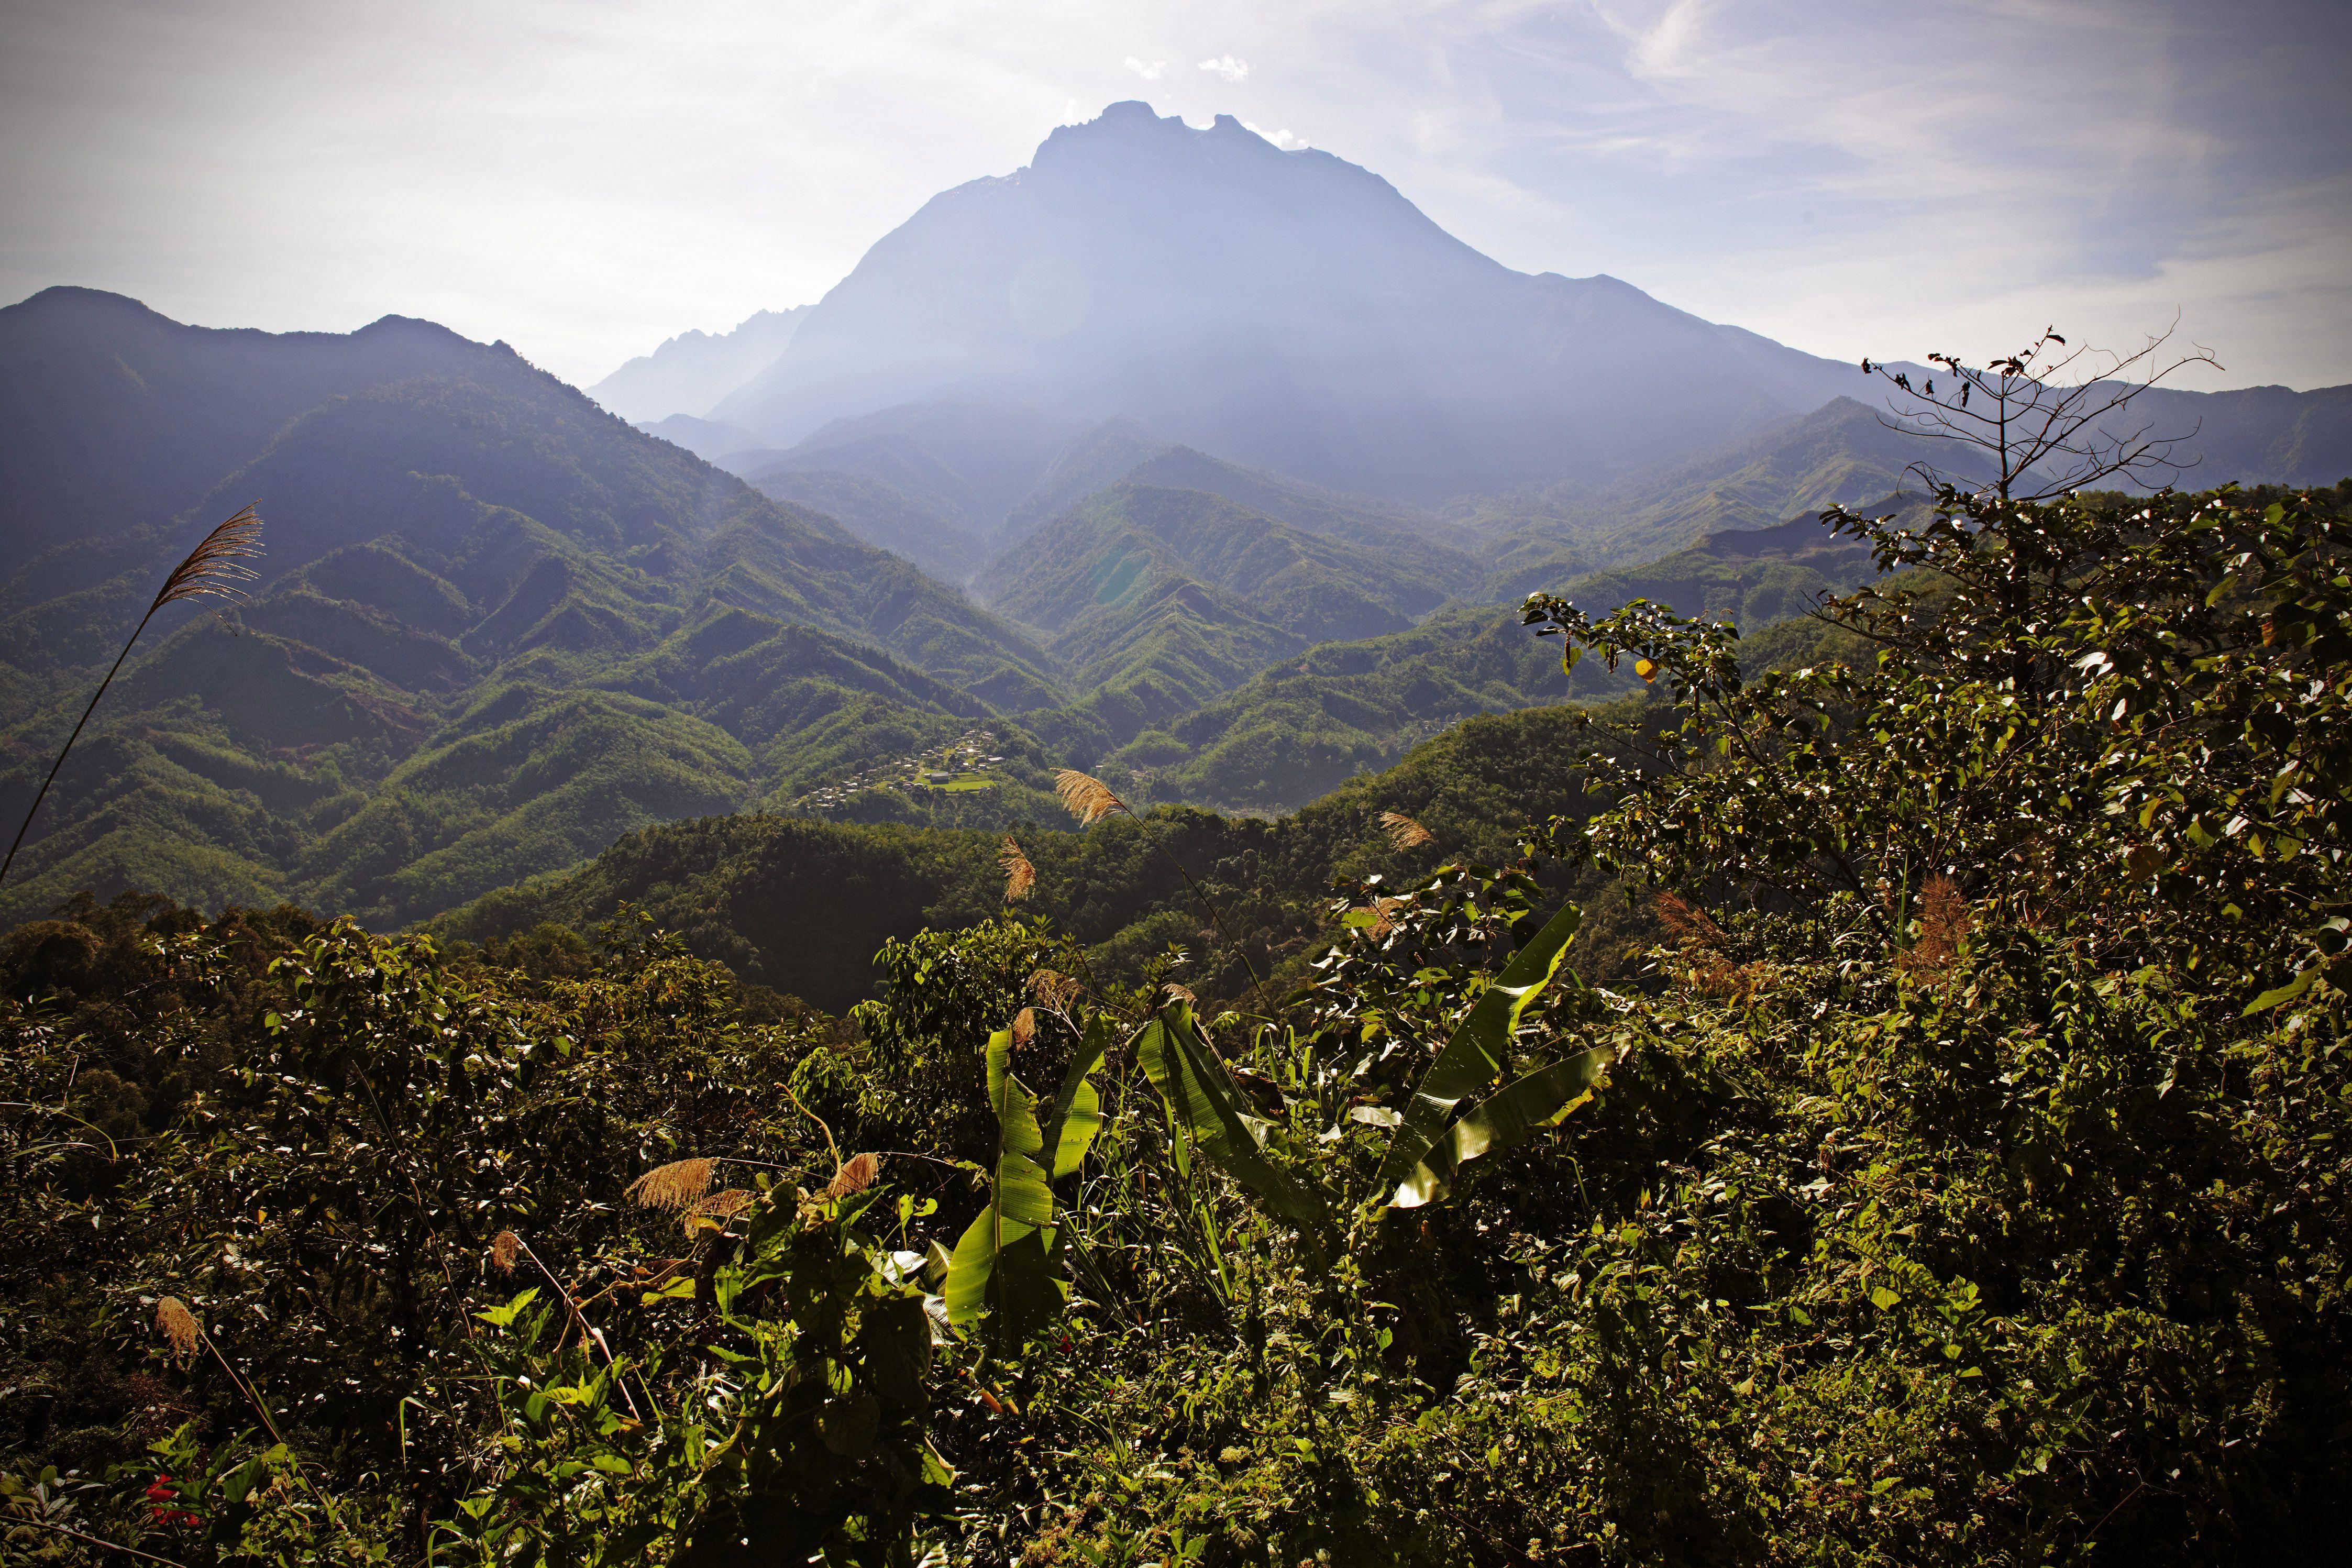 Mount Kinabalu in Sabah, Borneo